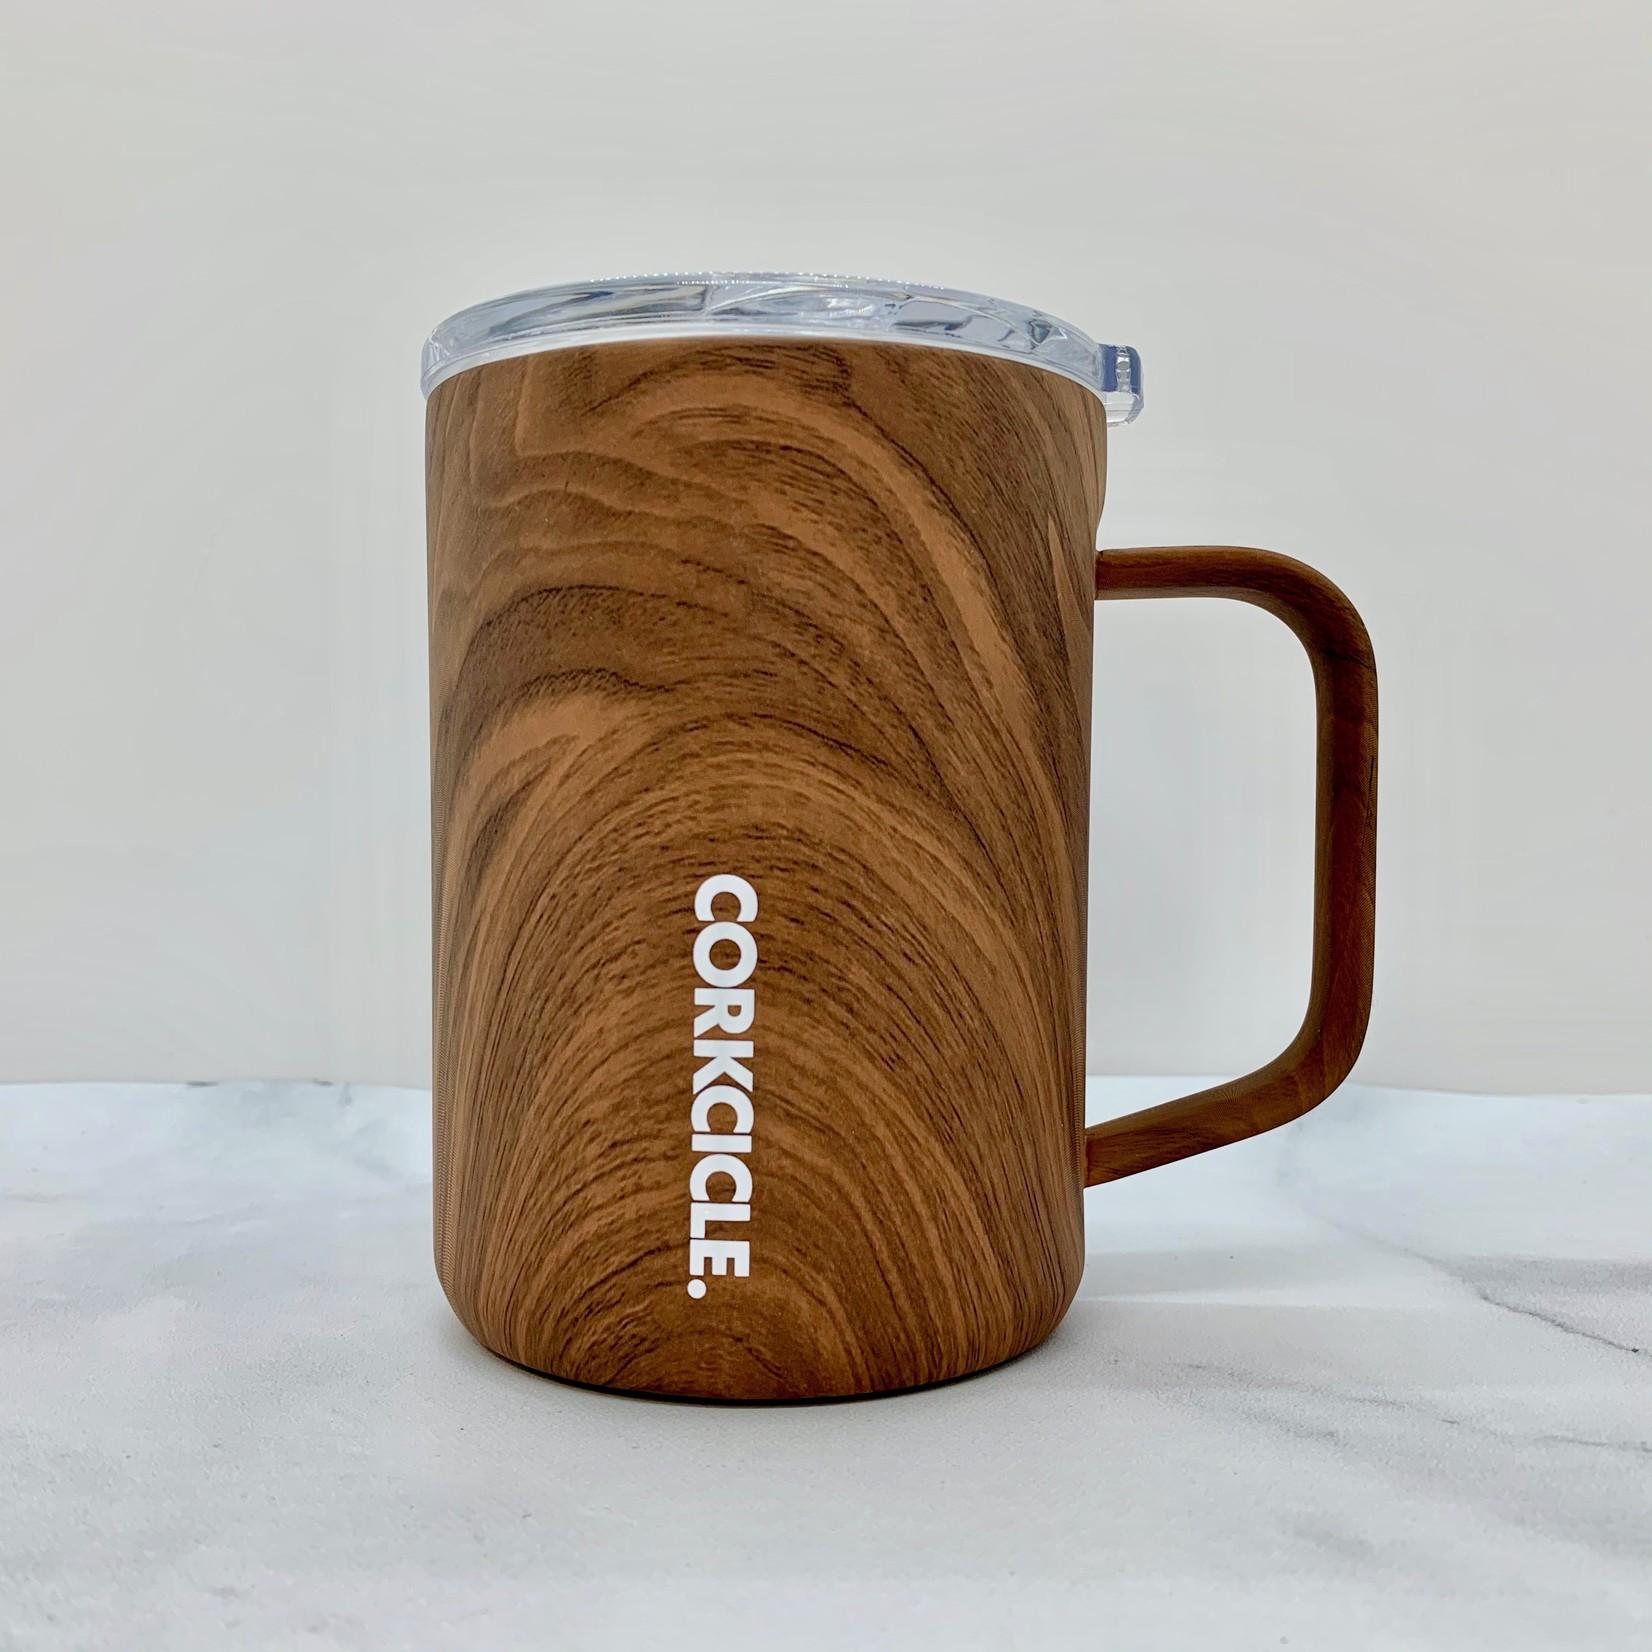 16oz Insulated Mug